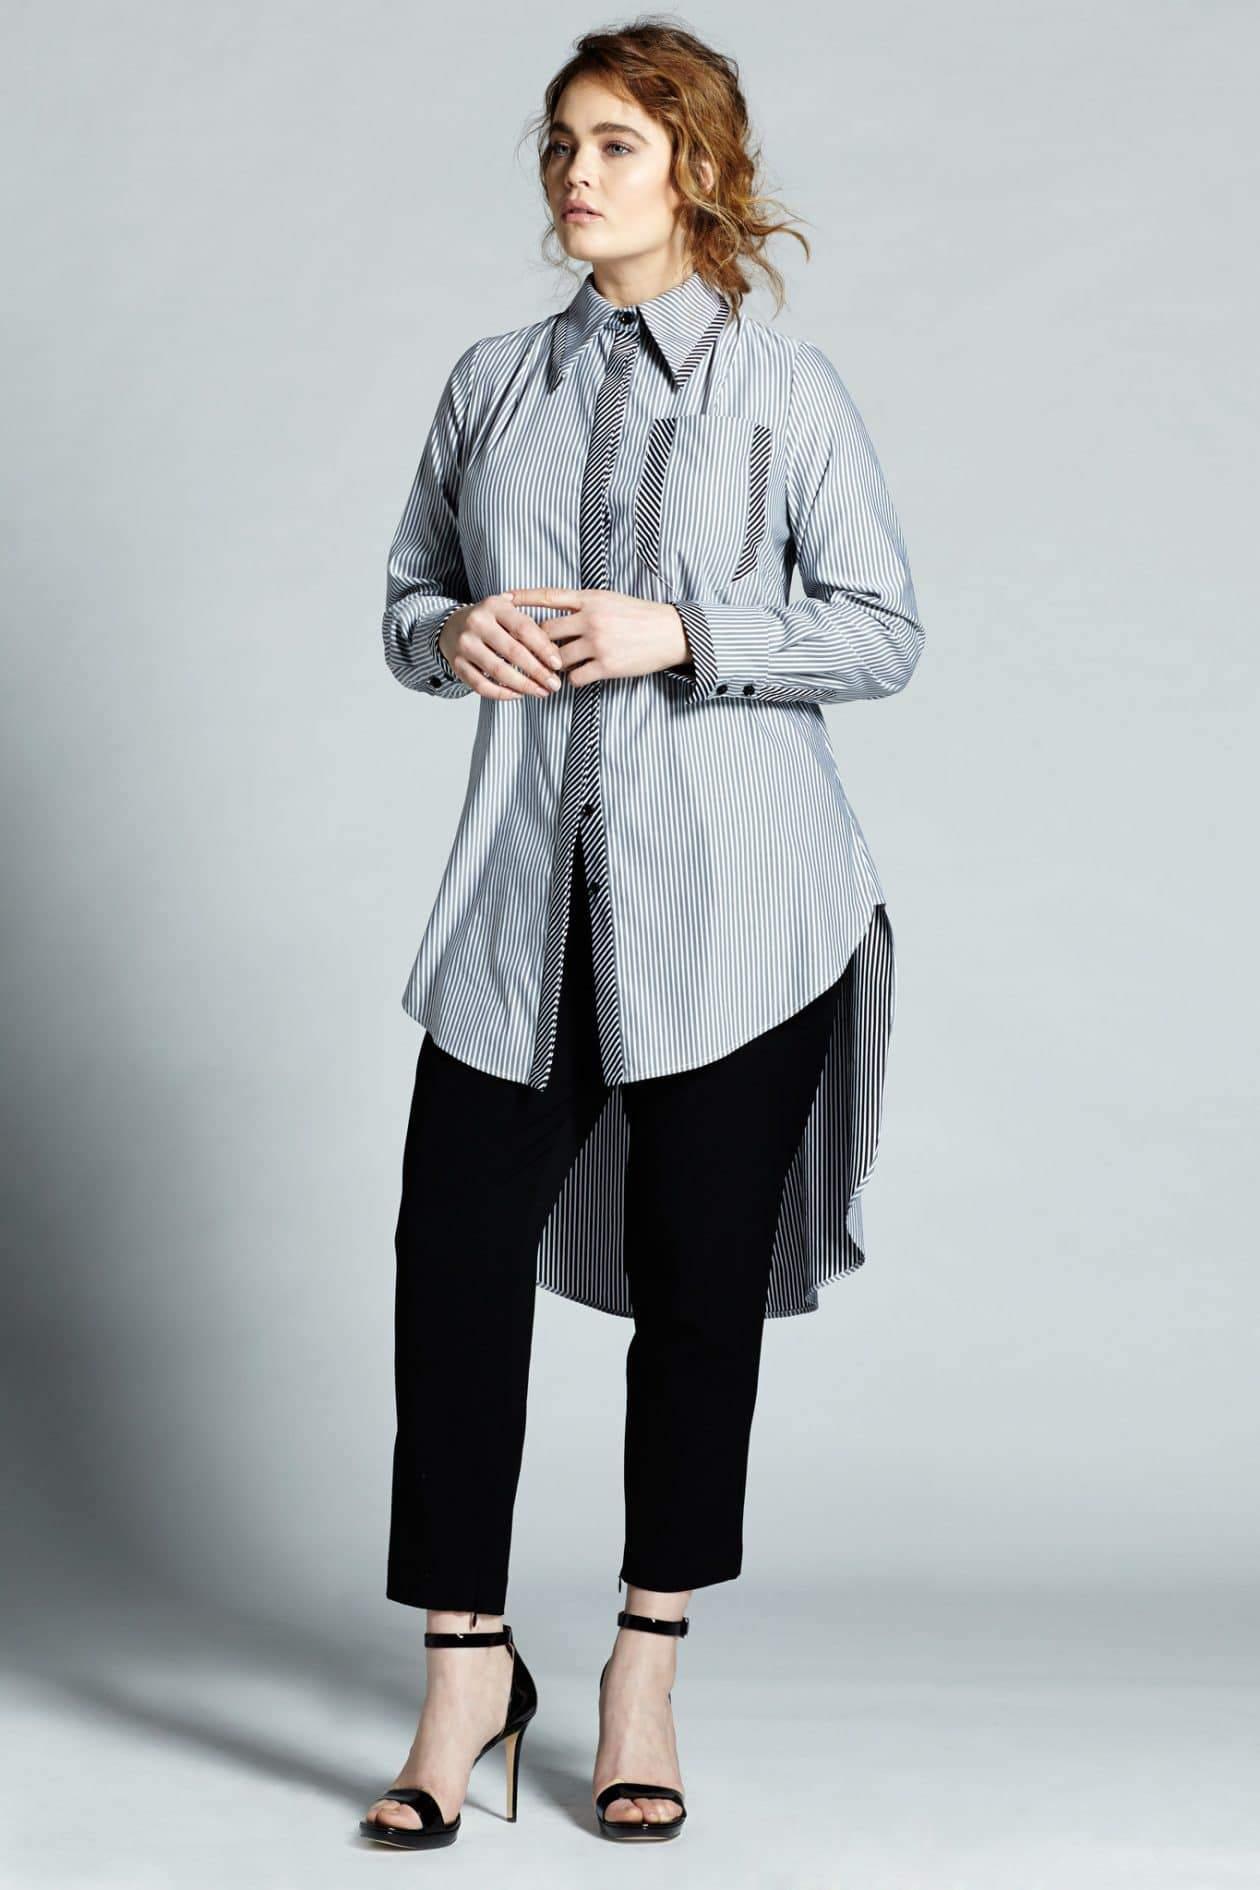 Shegul Plus Size Fashion